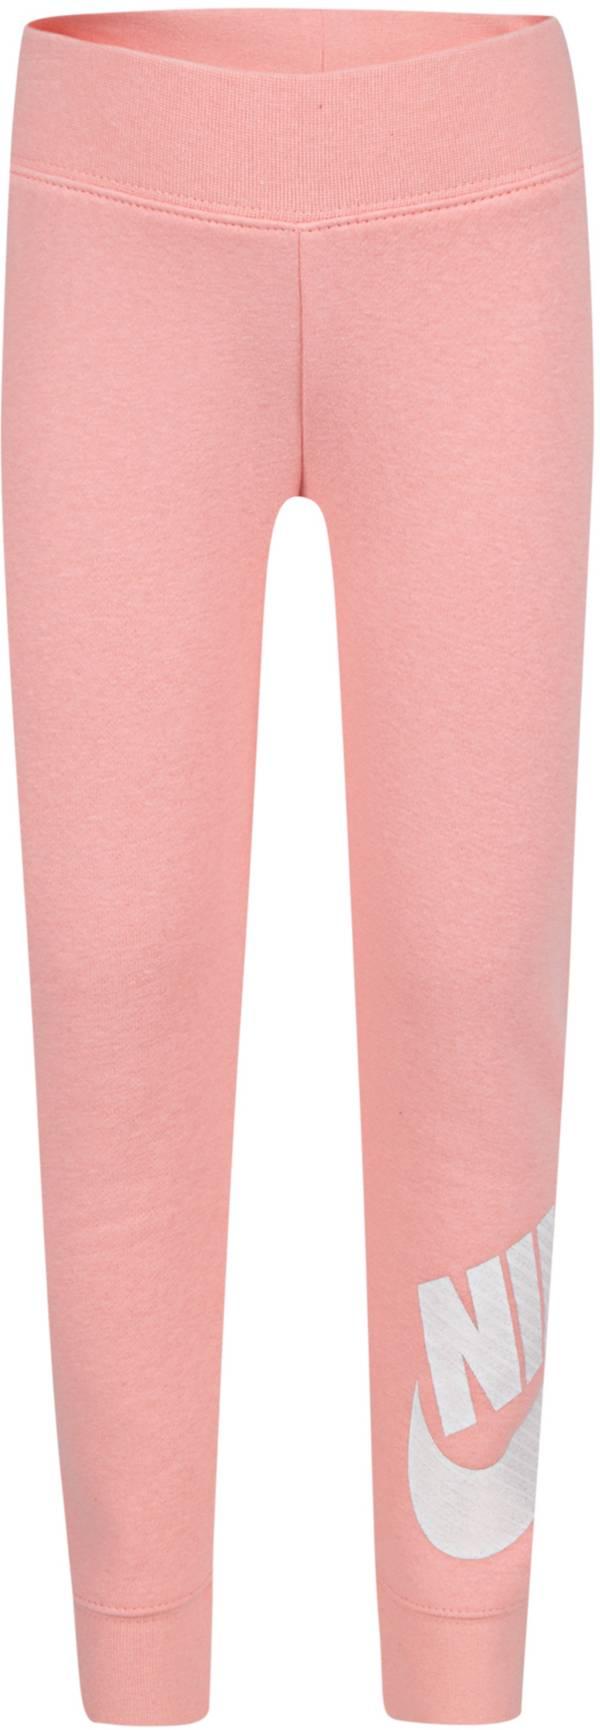 Nike Little Girls' Futura Fleece Jogger Pants product image